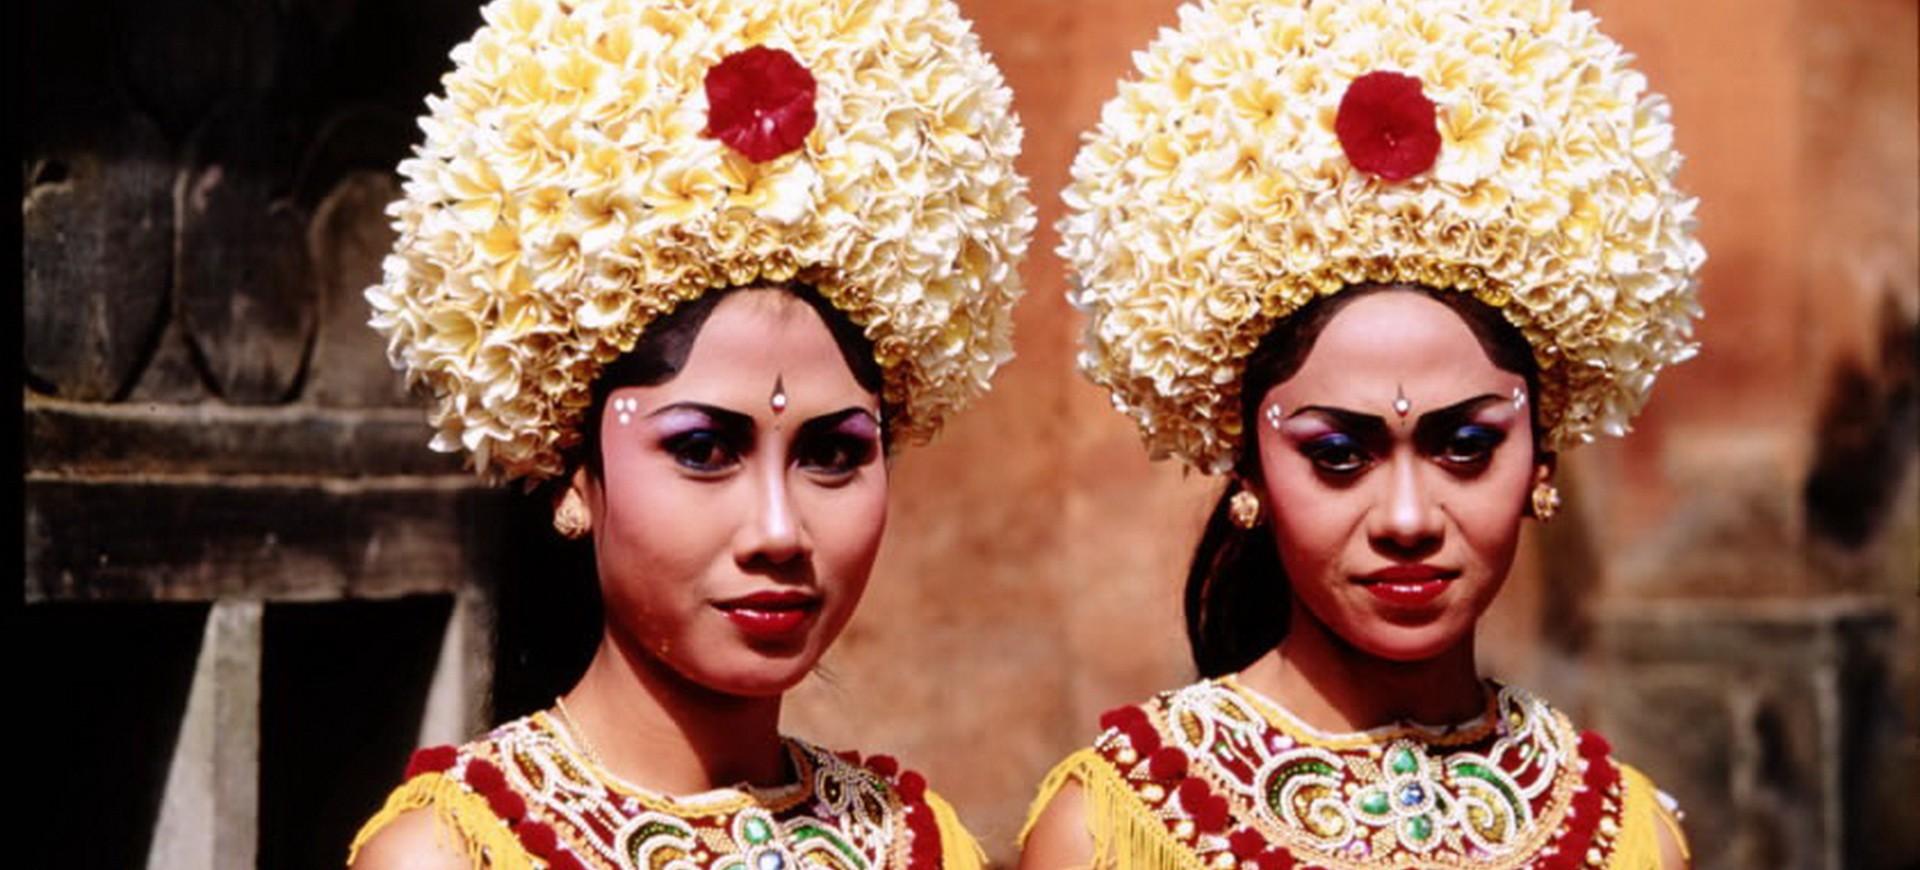 Danseuses Barong à Bali